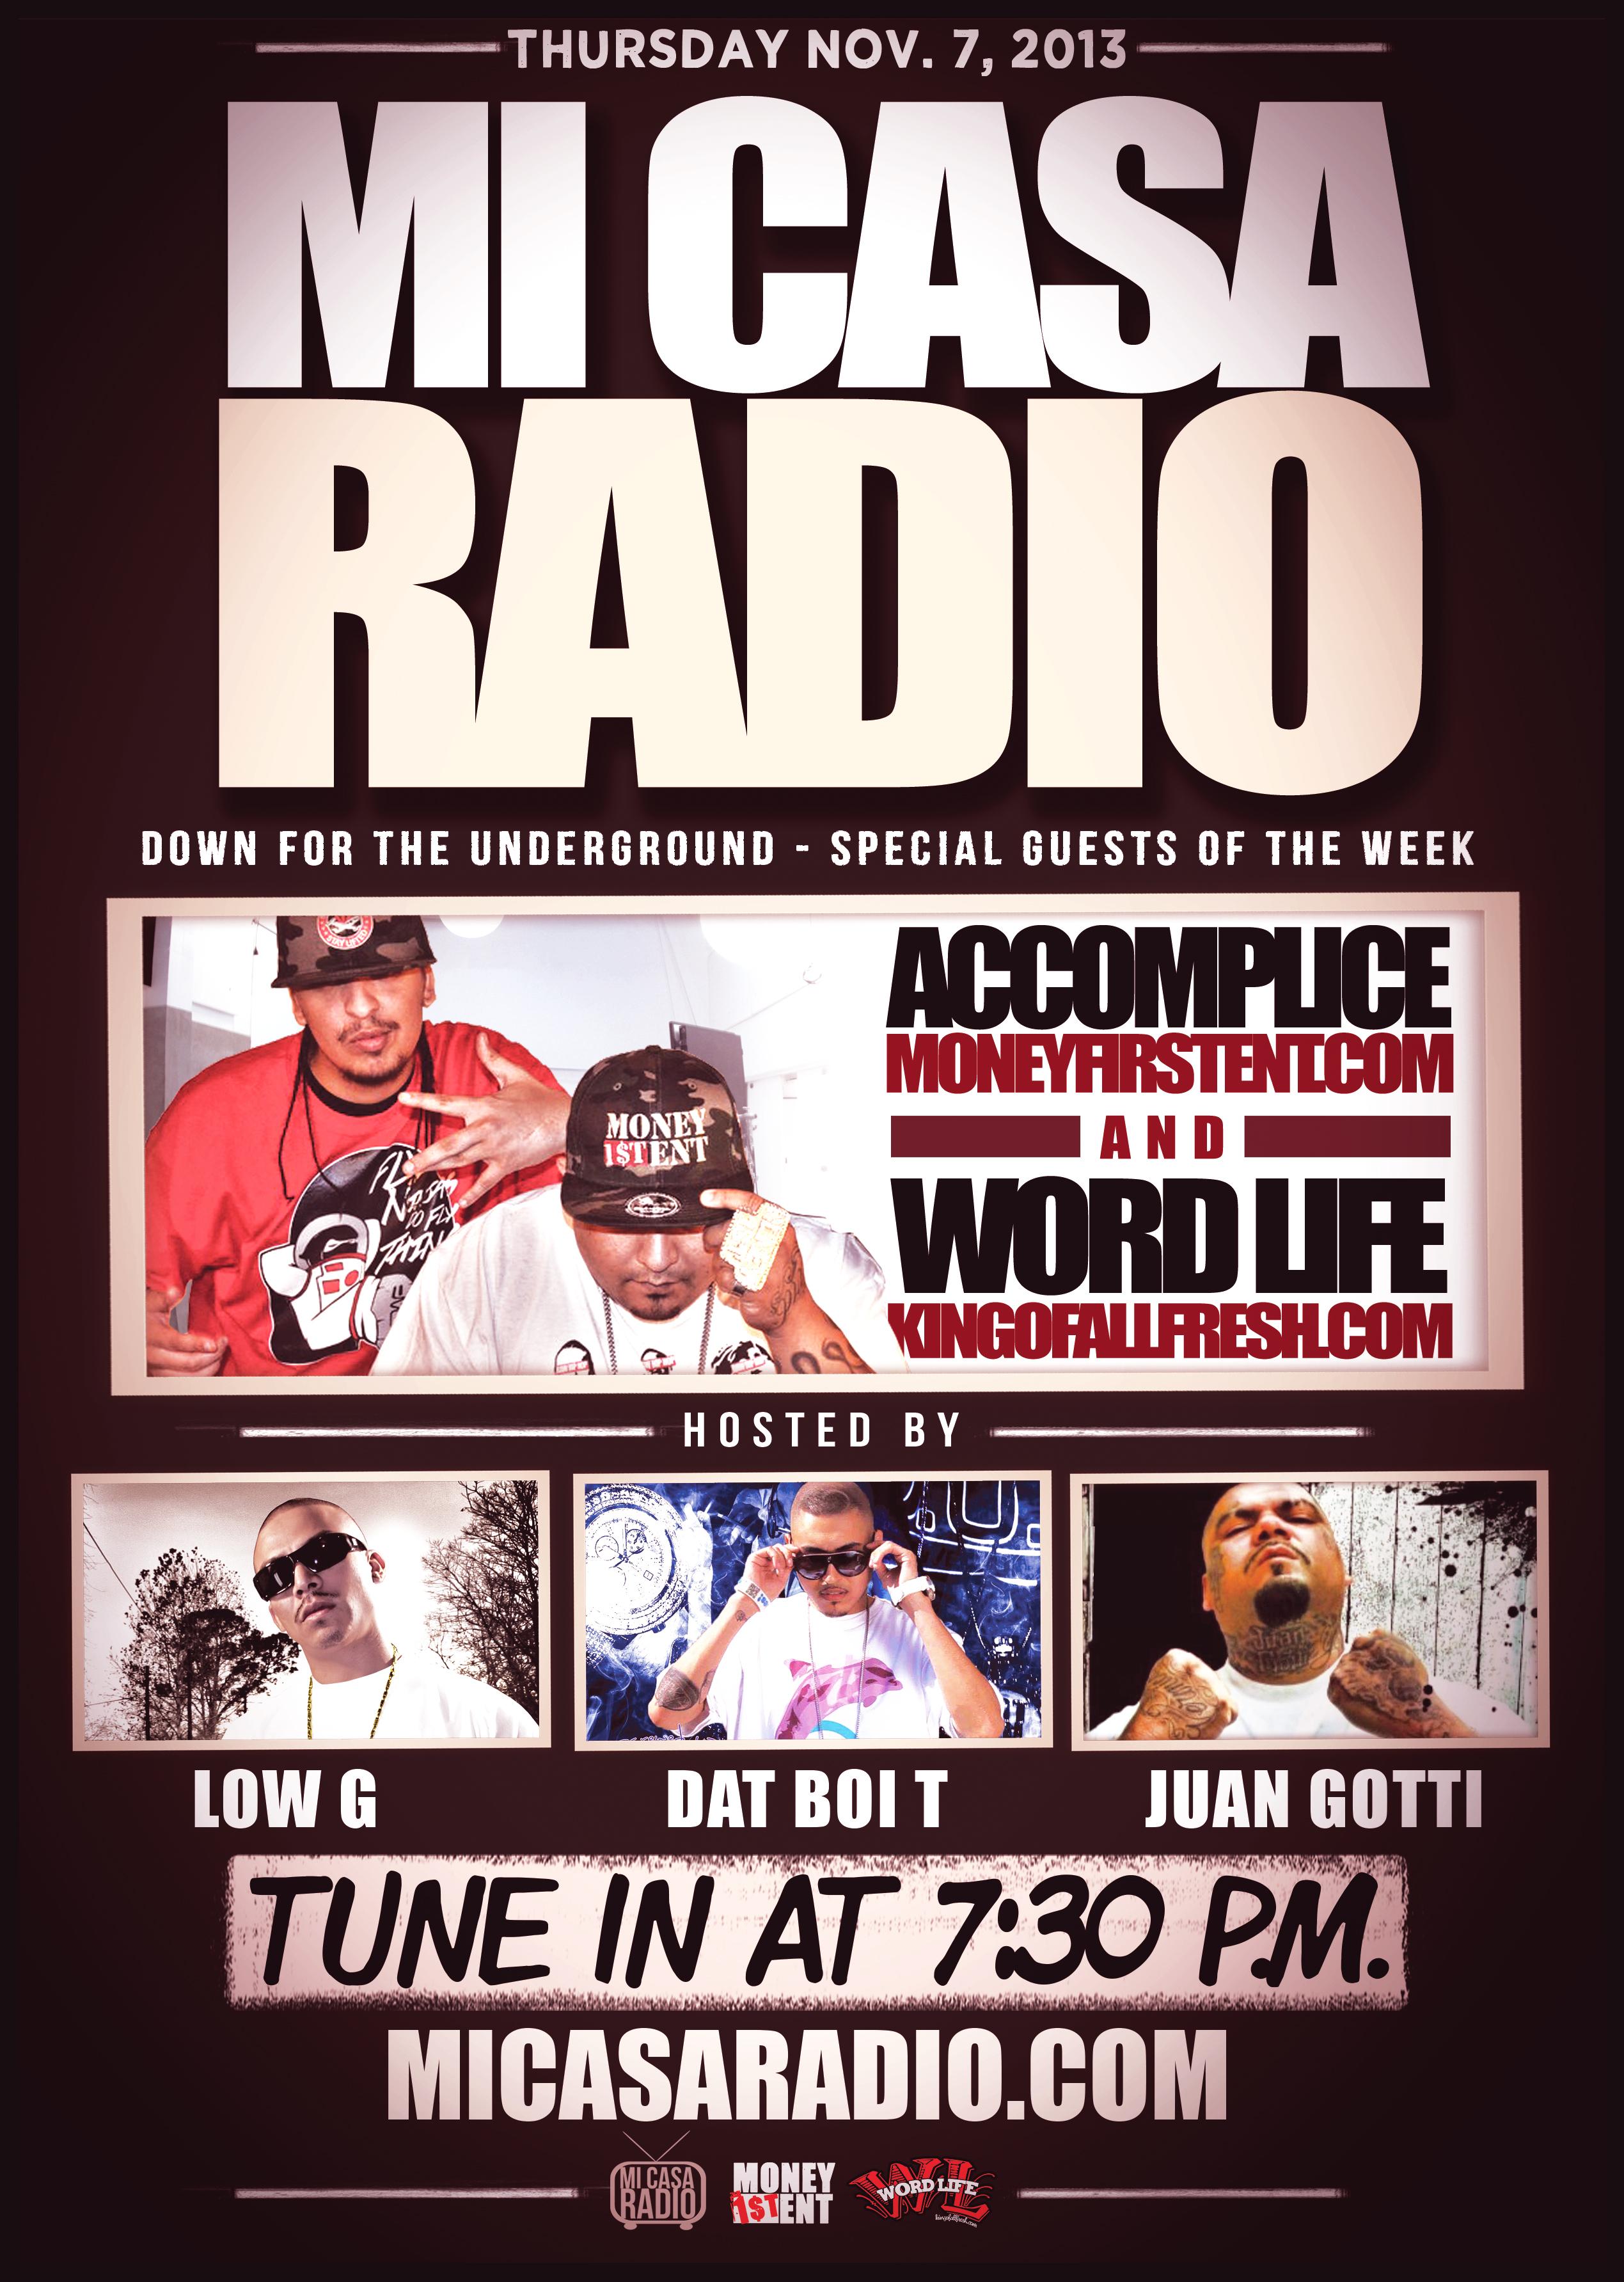 Word life live on mi casa online radio show in houston tx for Mi casa online